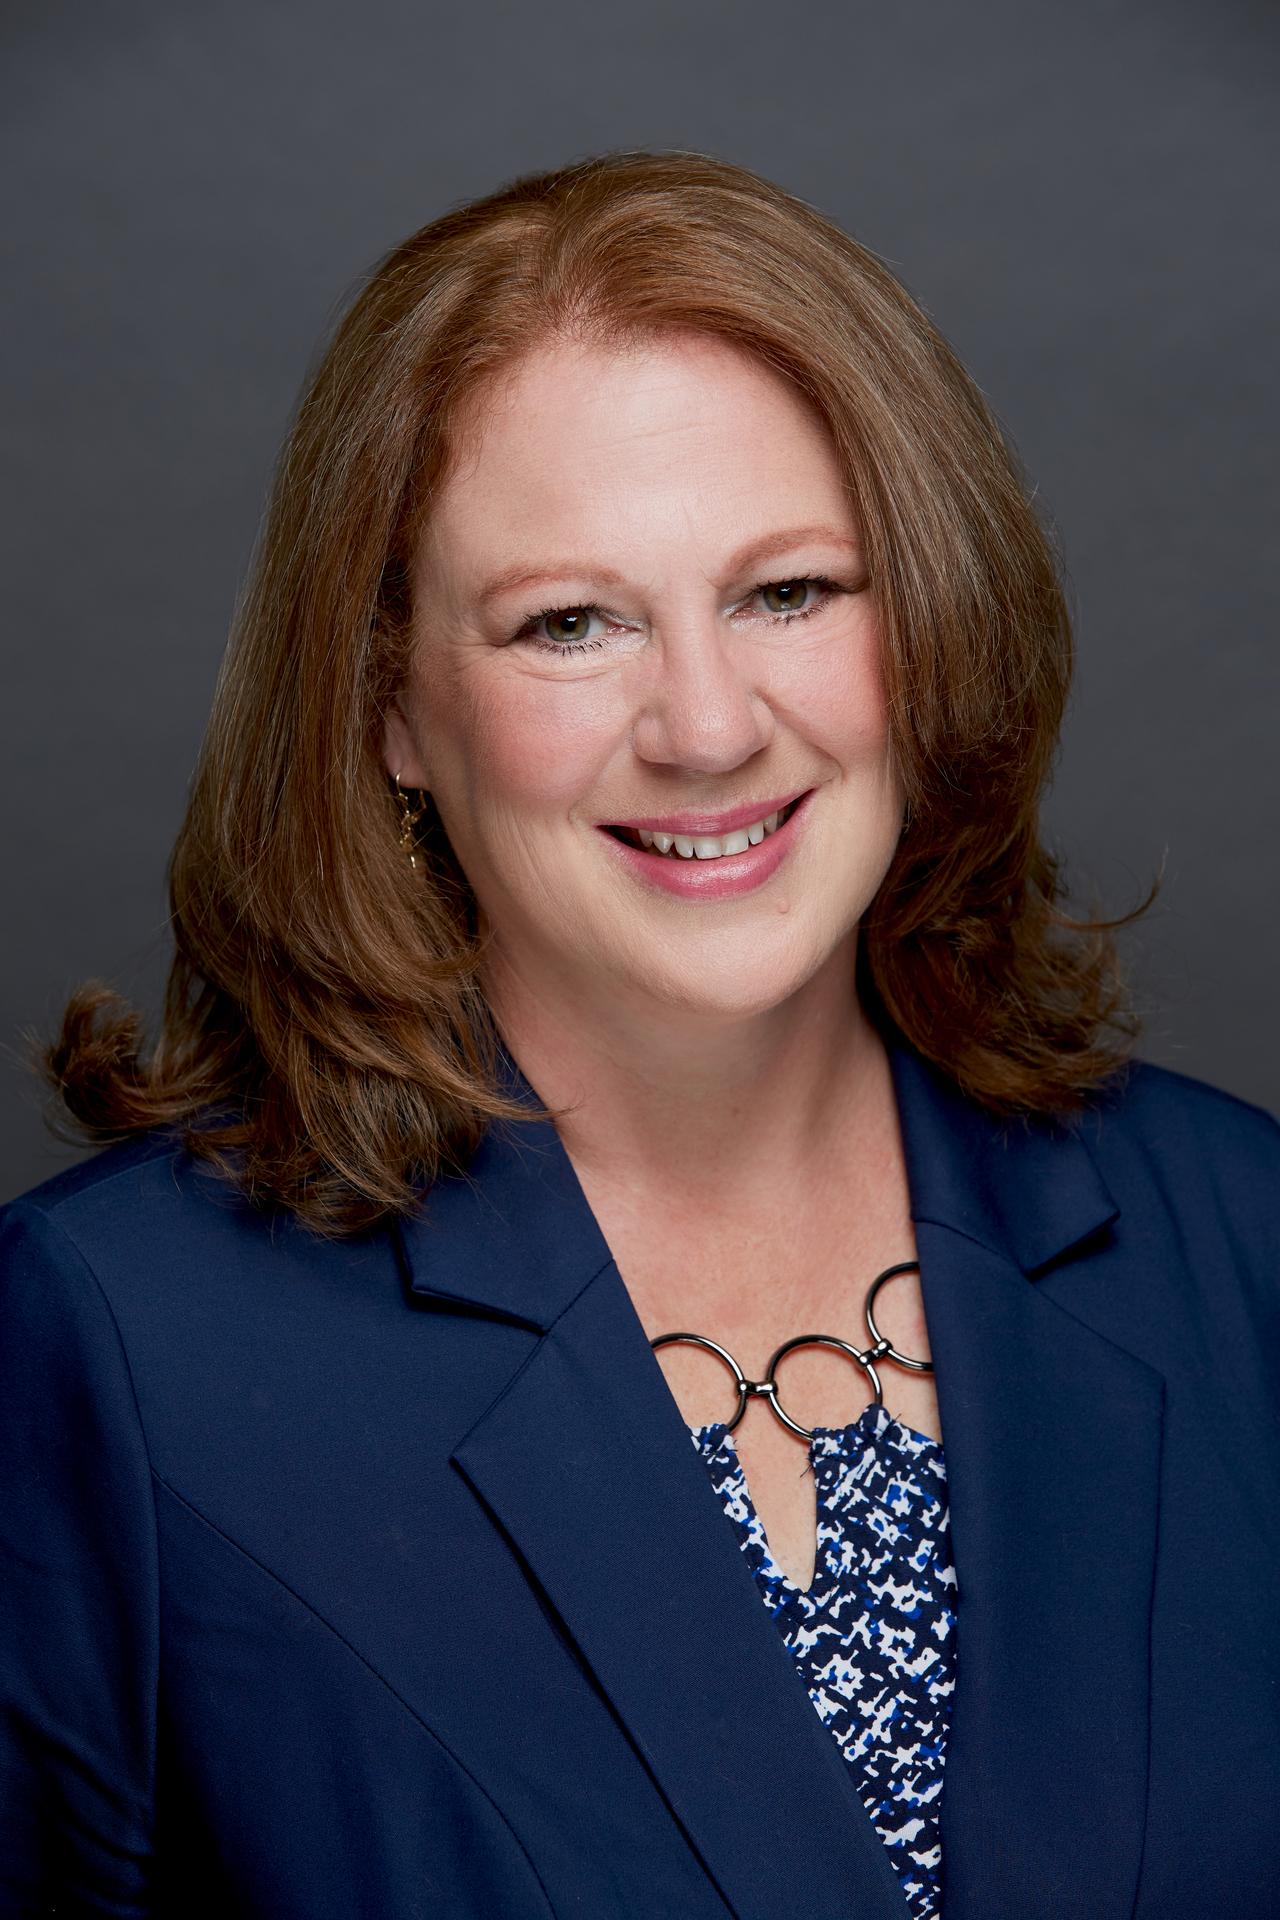 Cheri Thacker